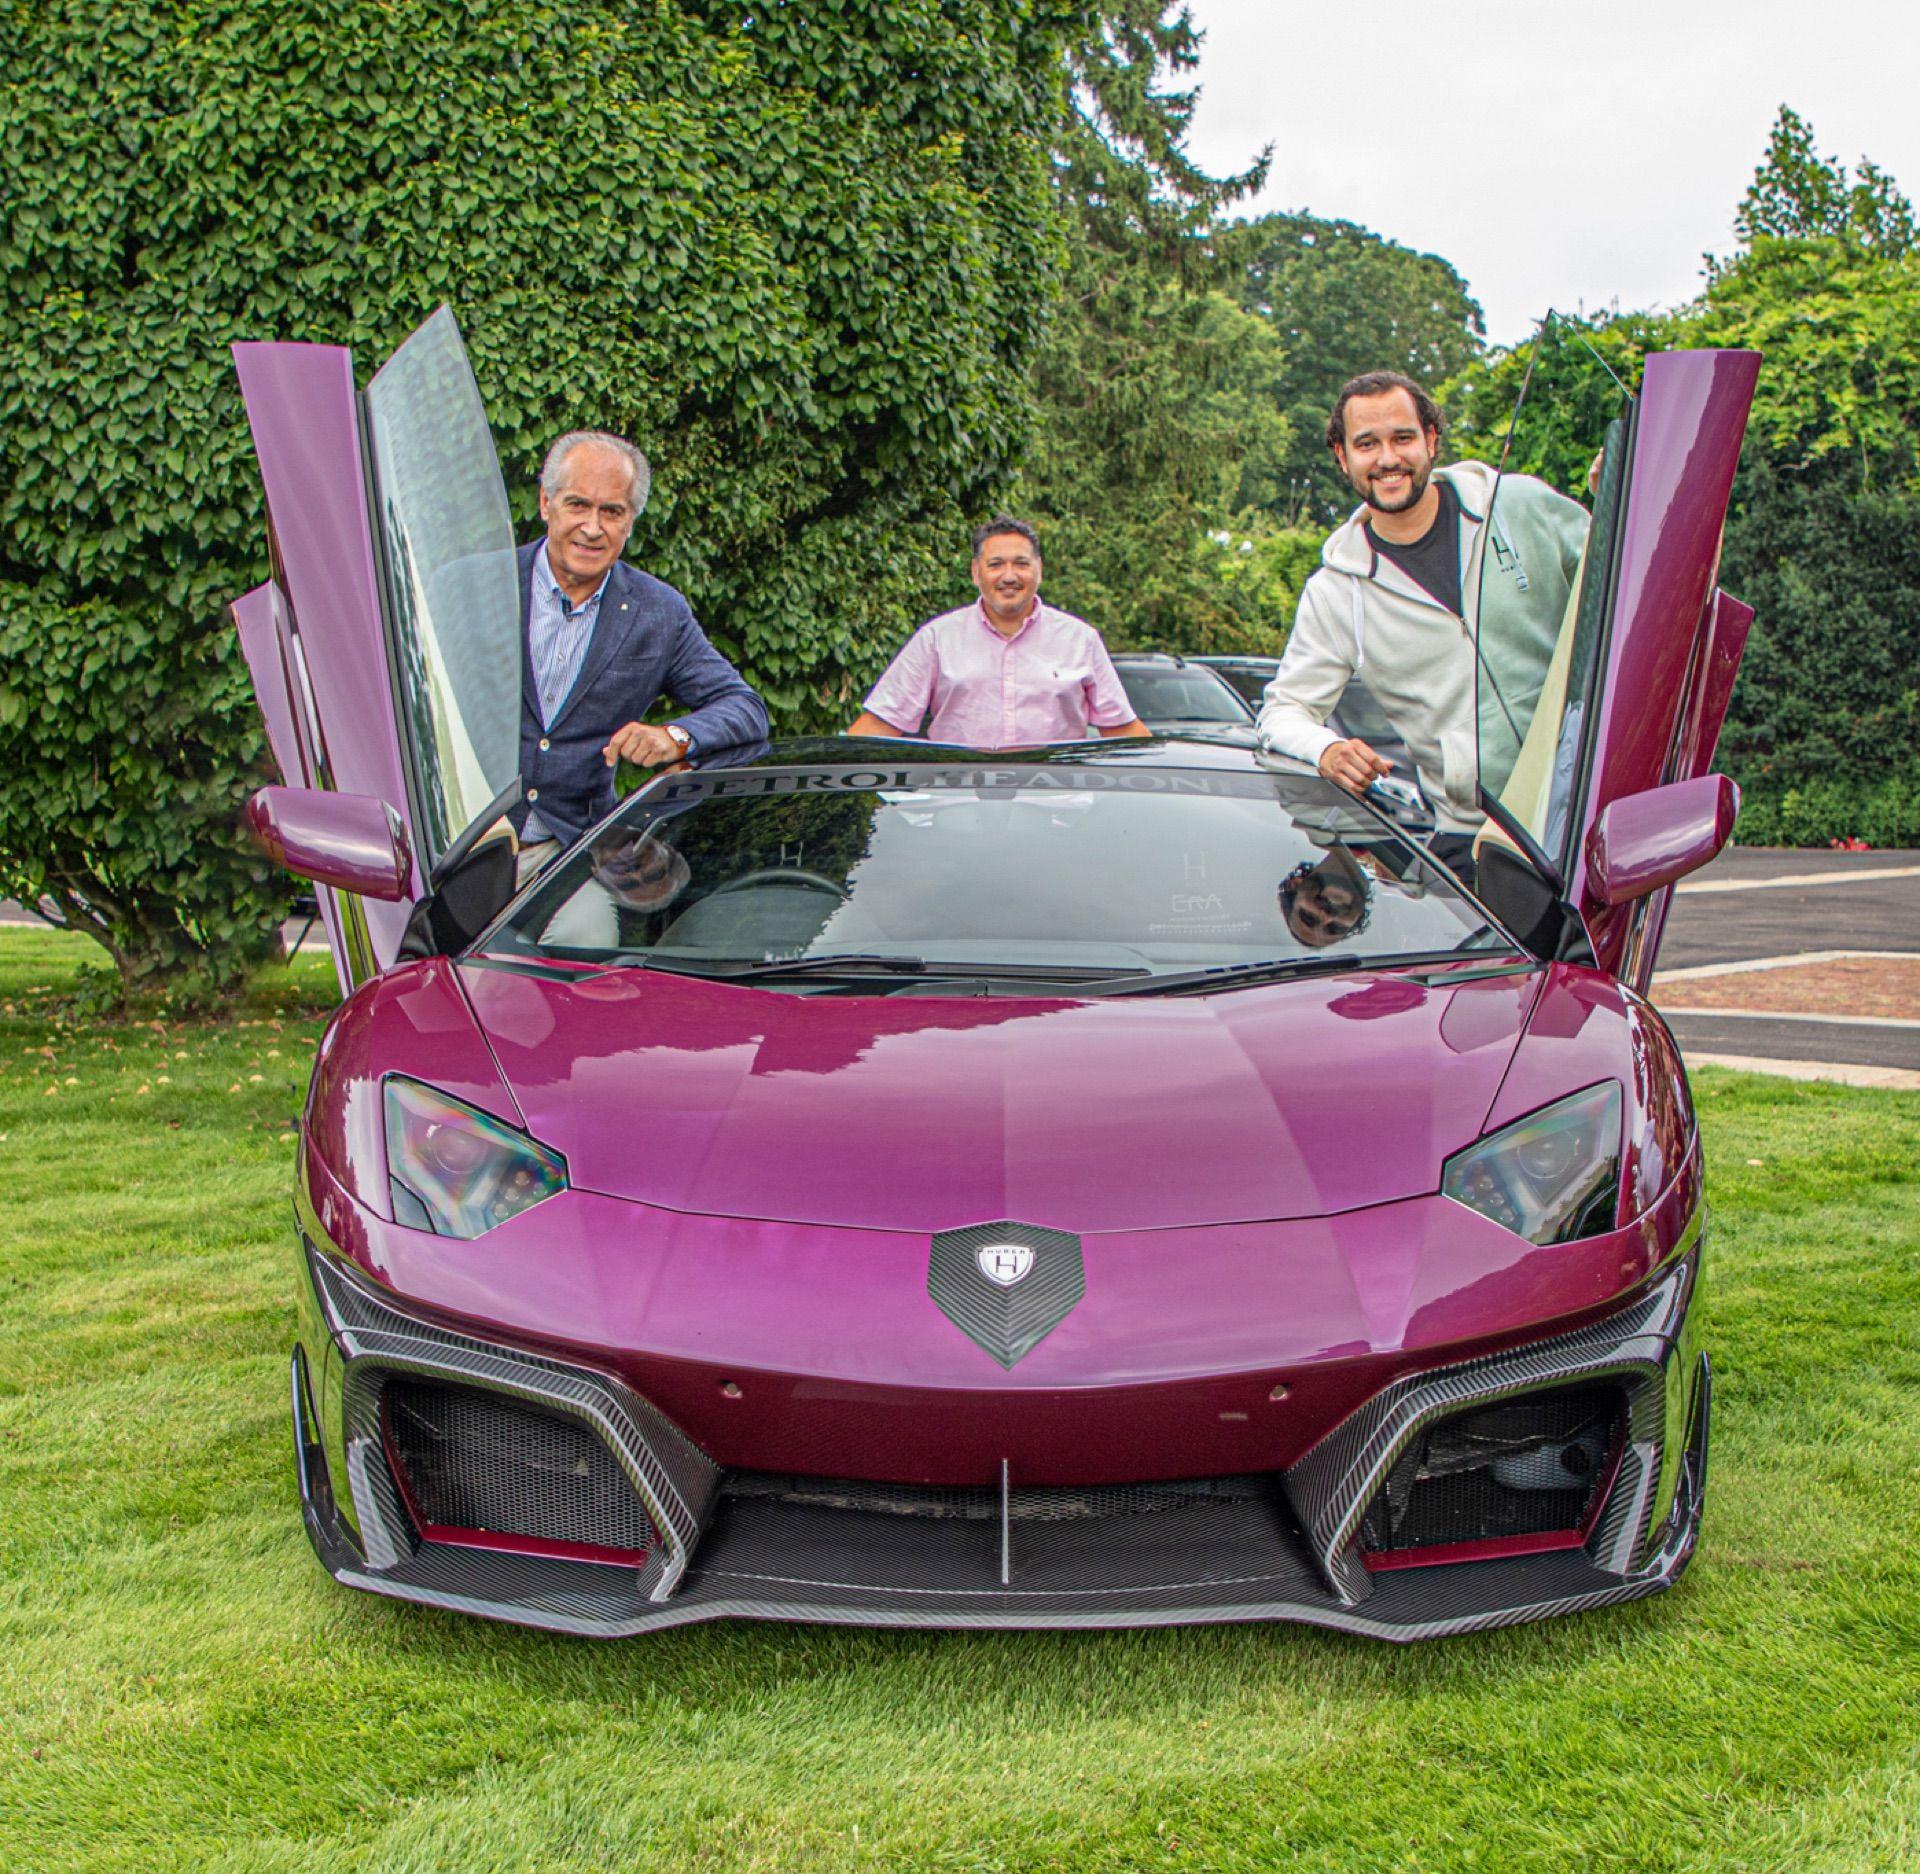 Huber-Era-Lamborghini-Aventador-2